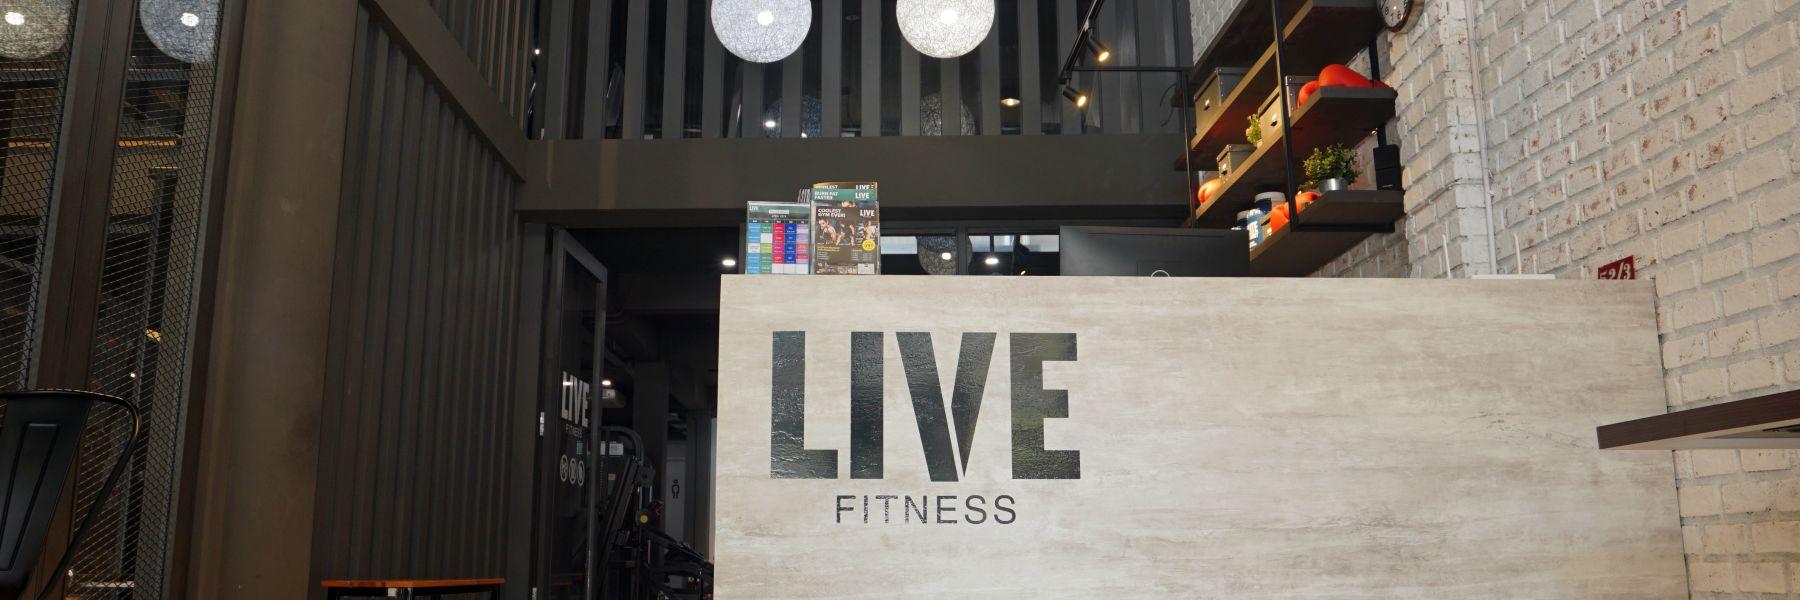 LIVE Fitness image